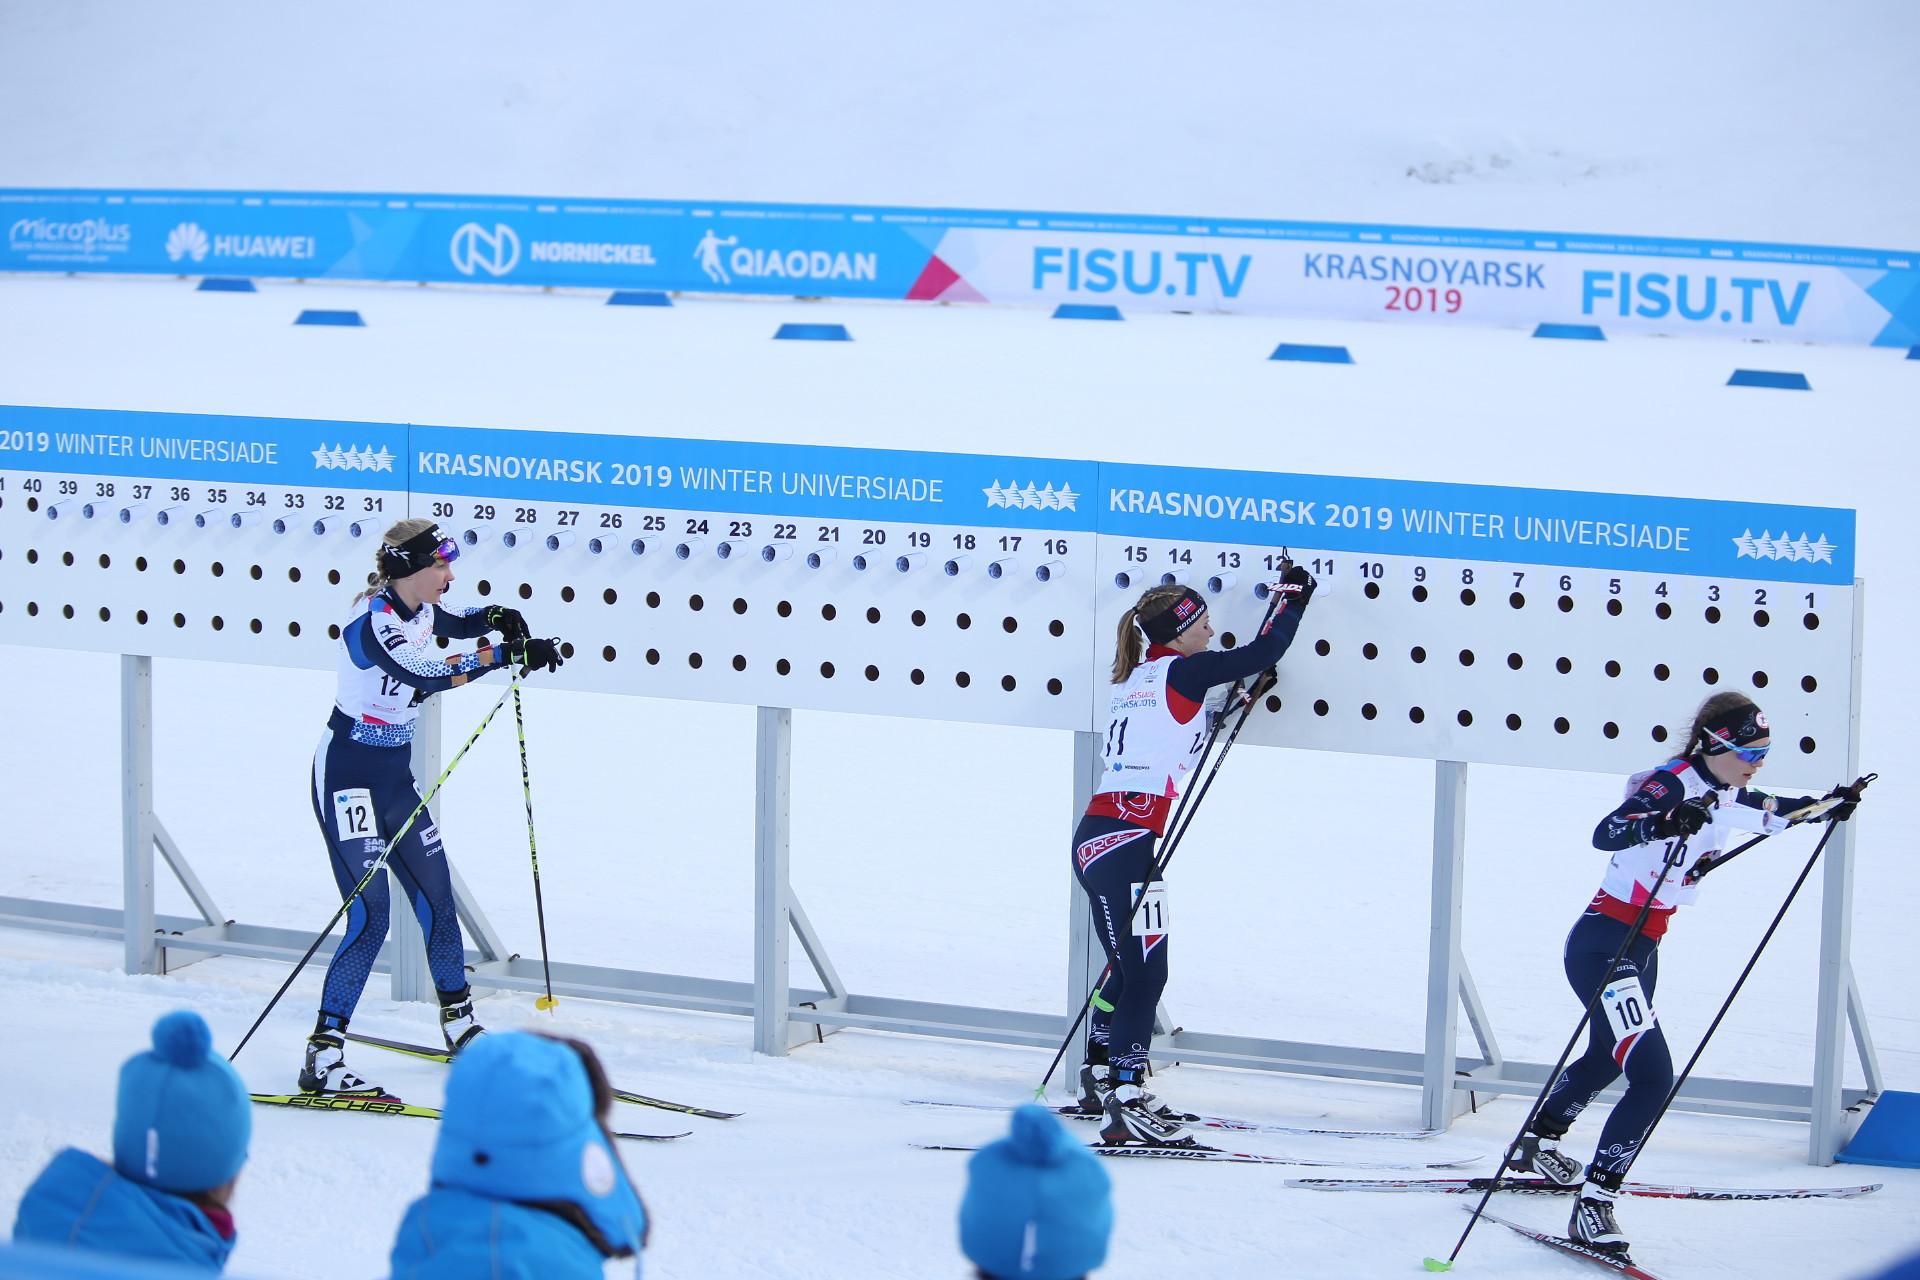 Russia's Marina Viatkina triumphed in the women's ski orienteering pursuit event at the Krasnoyarsk 2019 Winter Universiade ©Krasnoyarsk 2019